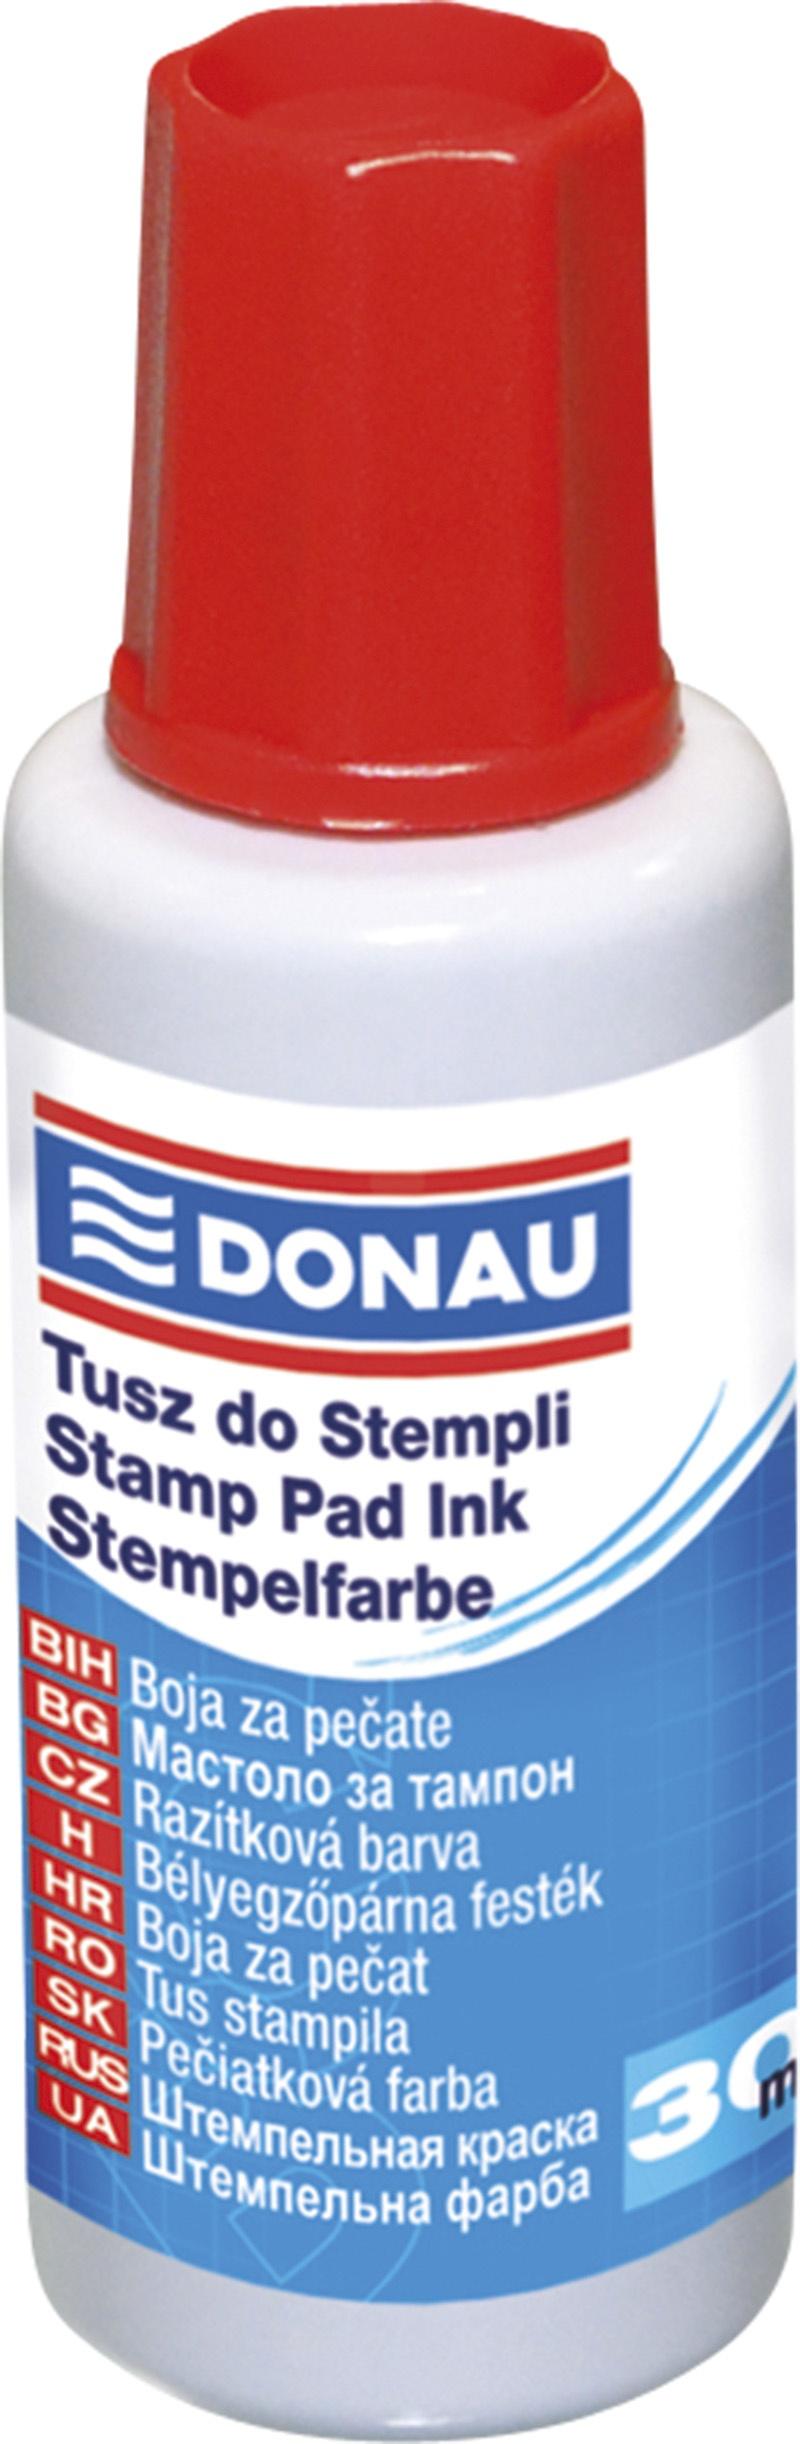 Tus stampile, 30ml, DONAU - rosu